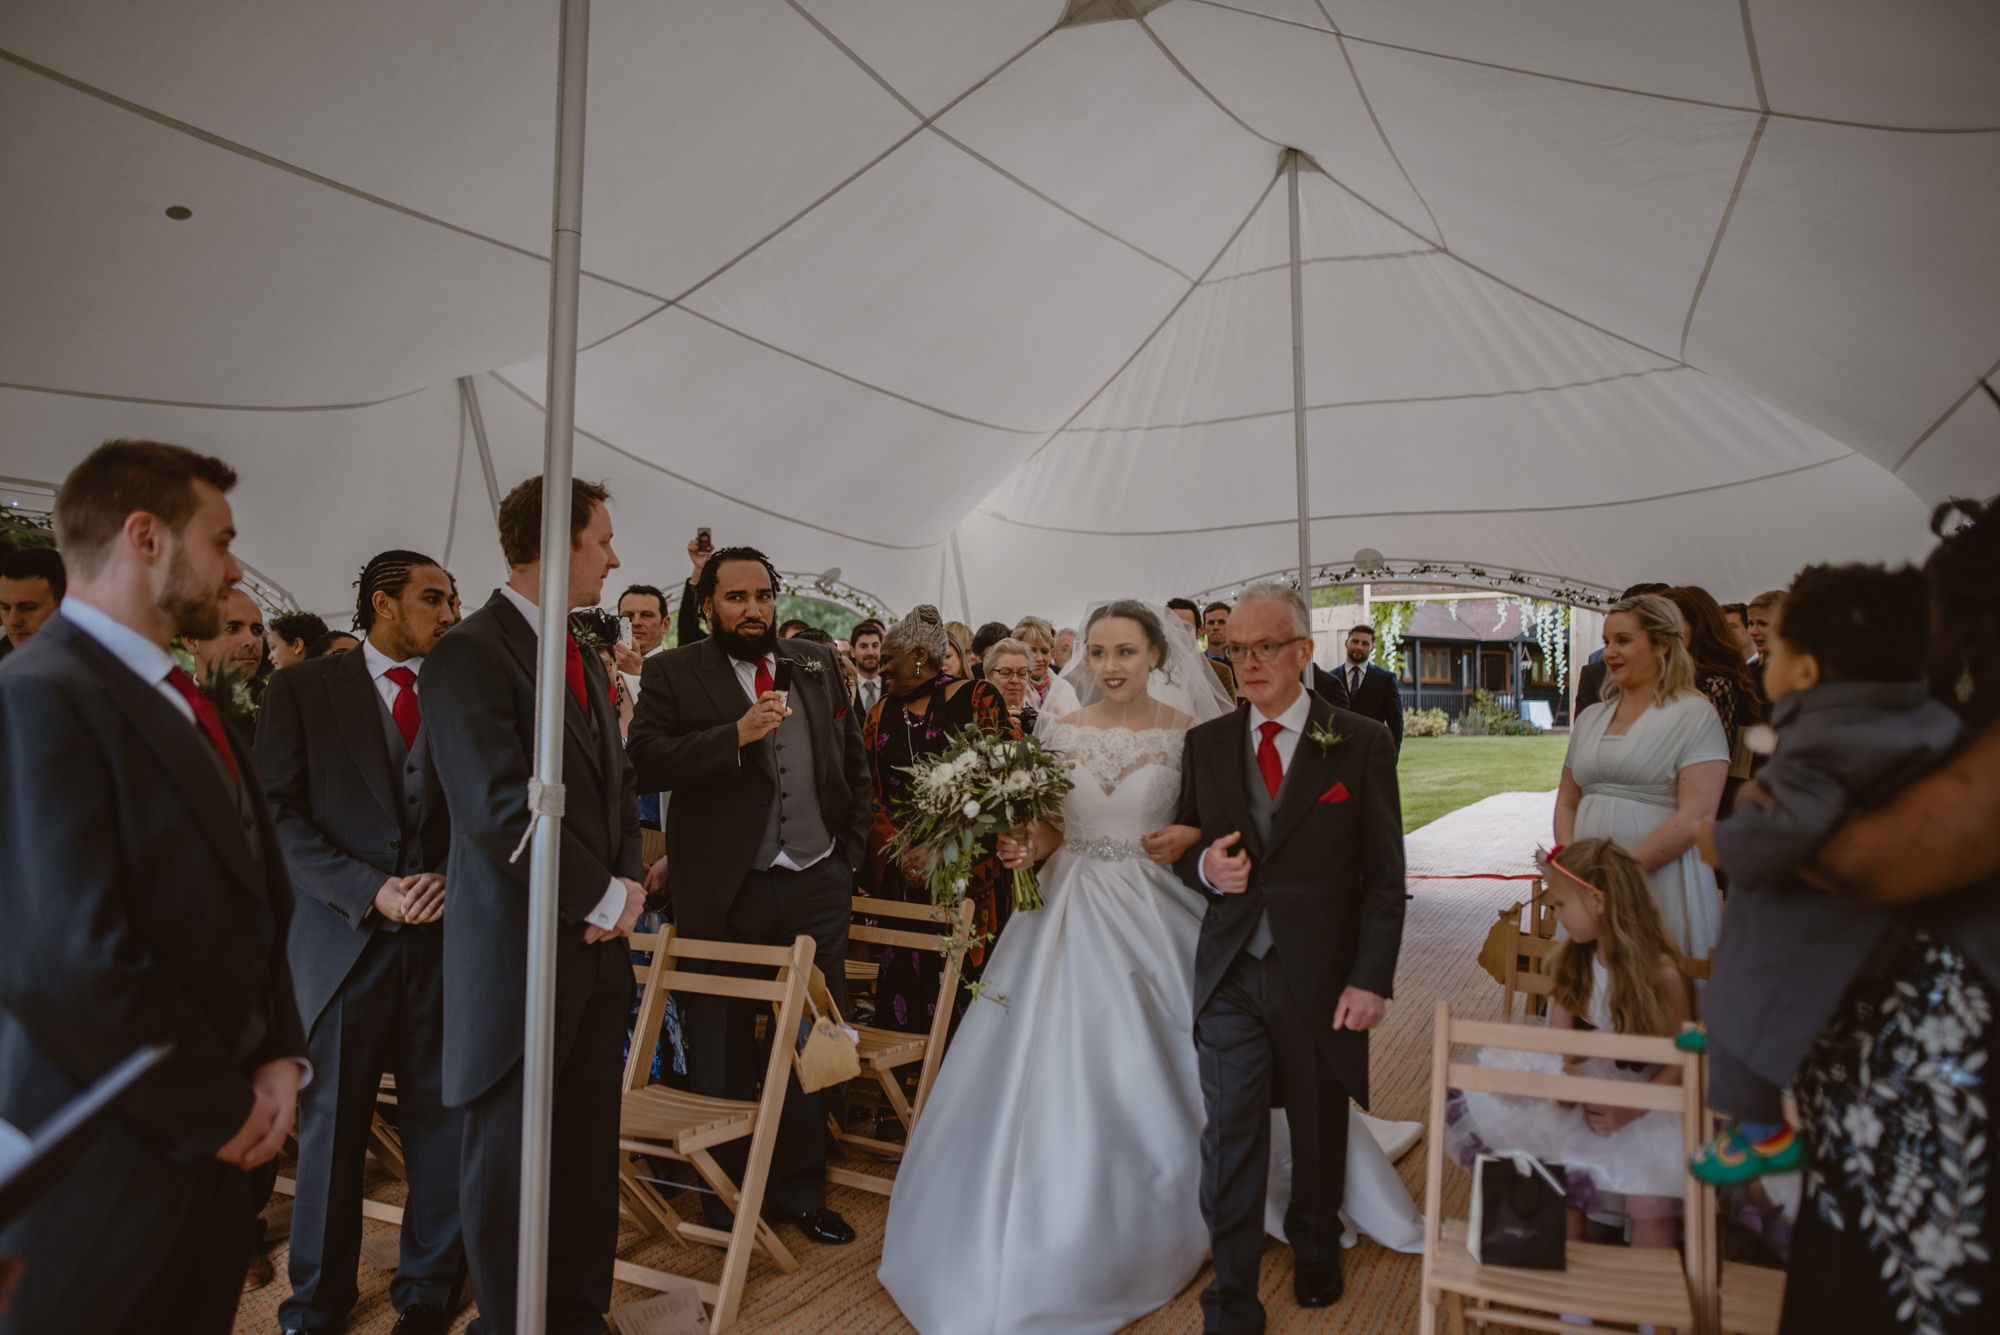 Jacqueline-Gareth-Wedding-Westmead-Events-Surrey-Manu-Mendoza-Wedding-Photography-193.jpg